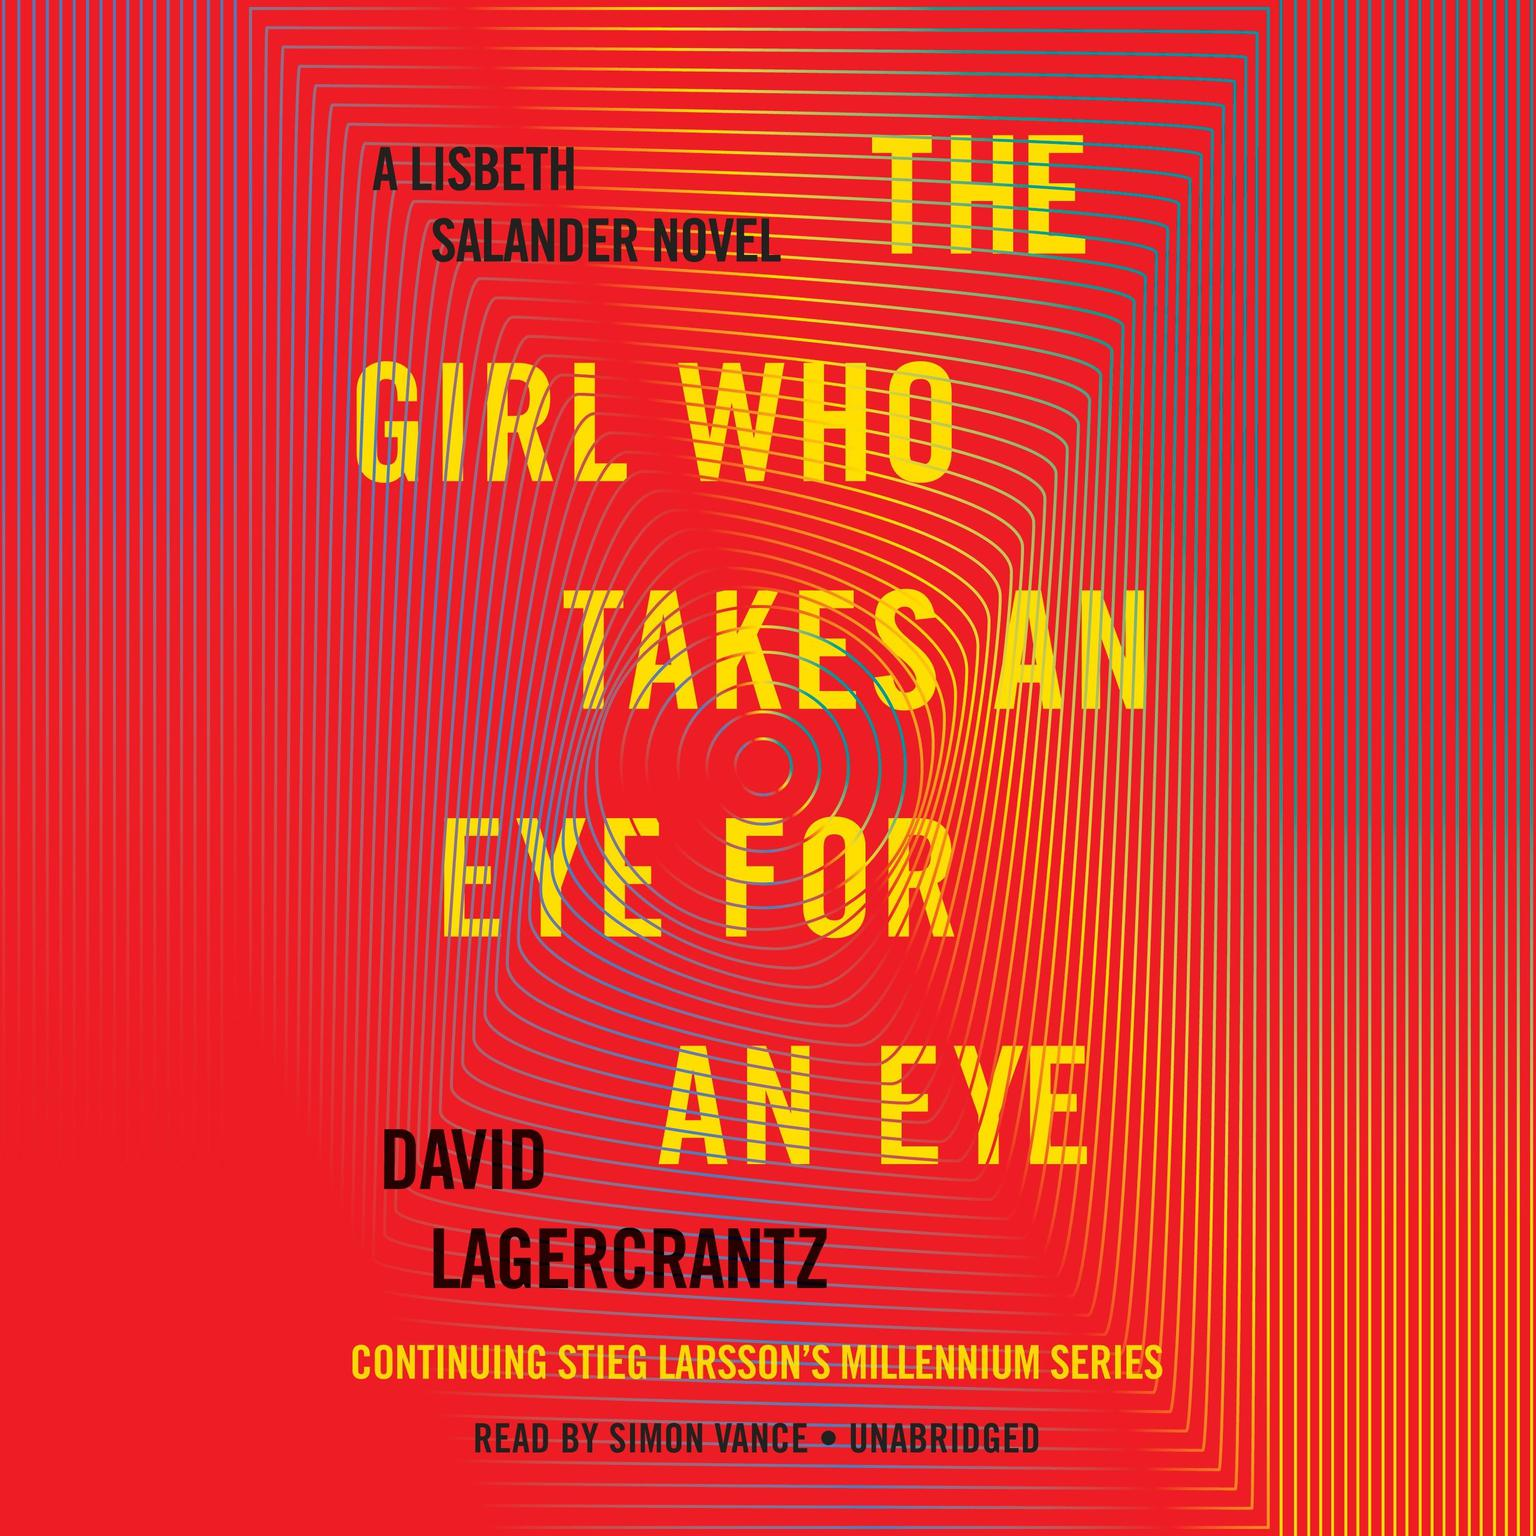 Printable The Girl Who Takes an Eye for an Eye: A Lisbeth Salander novel, continuing Stieg Larsson's Millennium Series Audiobook Cover Art